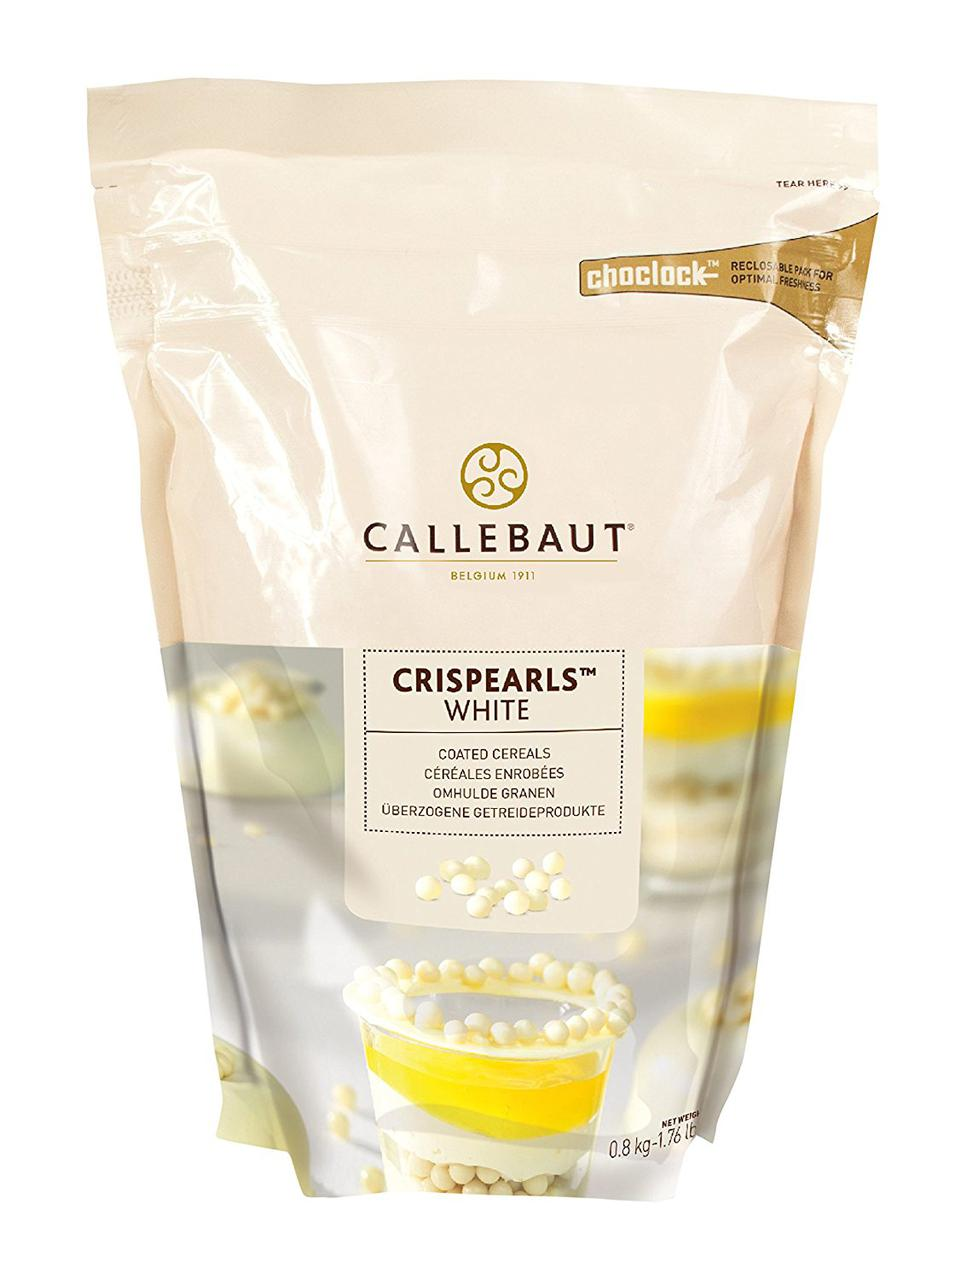 Callebaut White Chocolate Crispearls Шоколадні драже з білого шоколаду Пакет 0,8 кг.